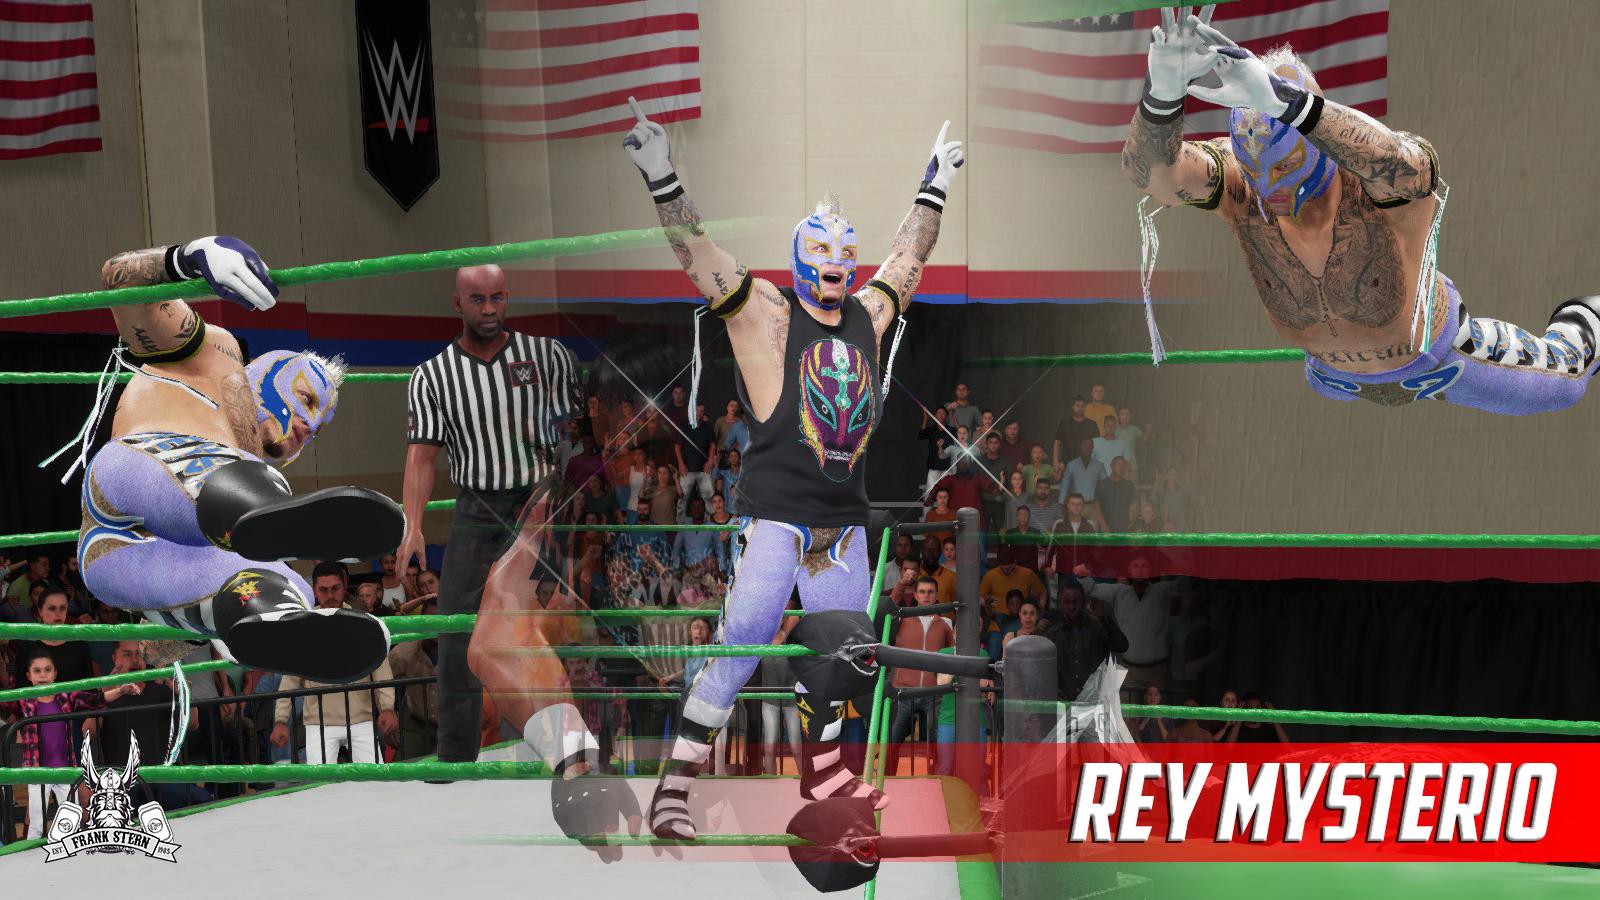 Rey-Mysterio.jpg